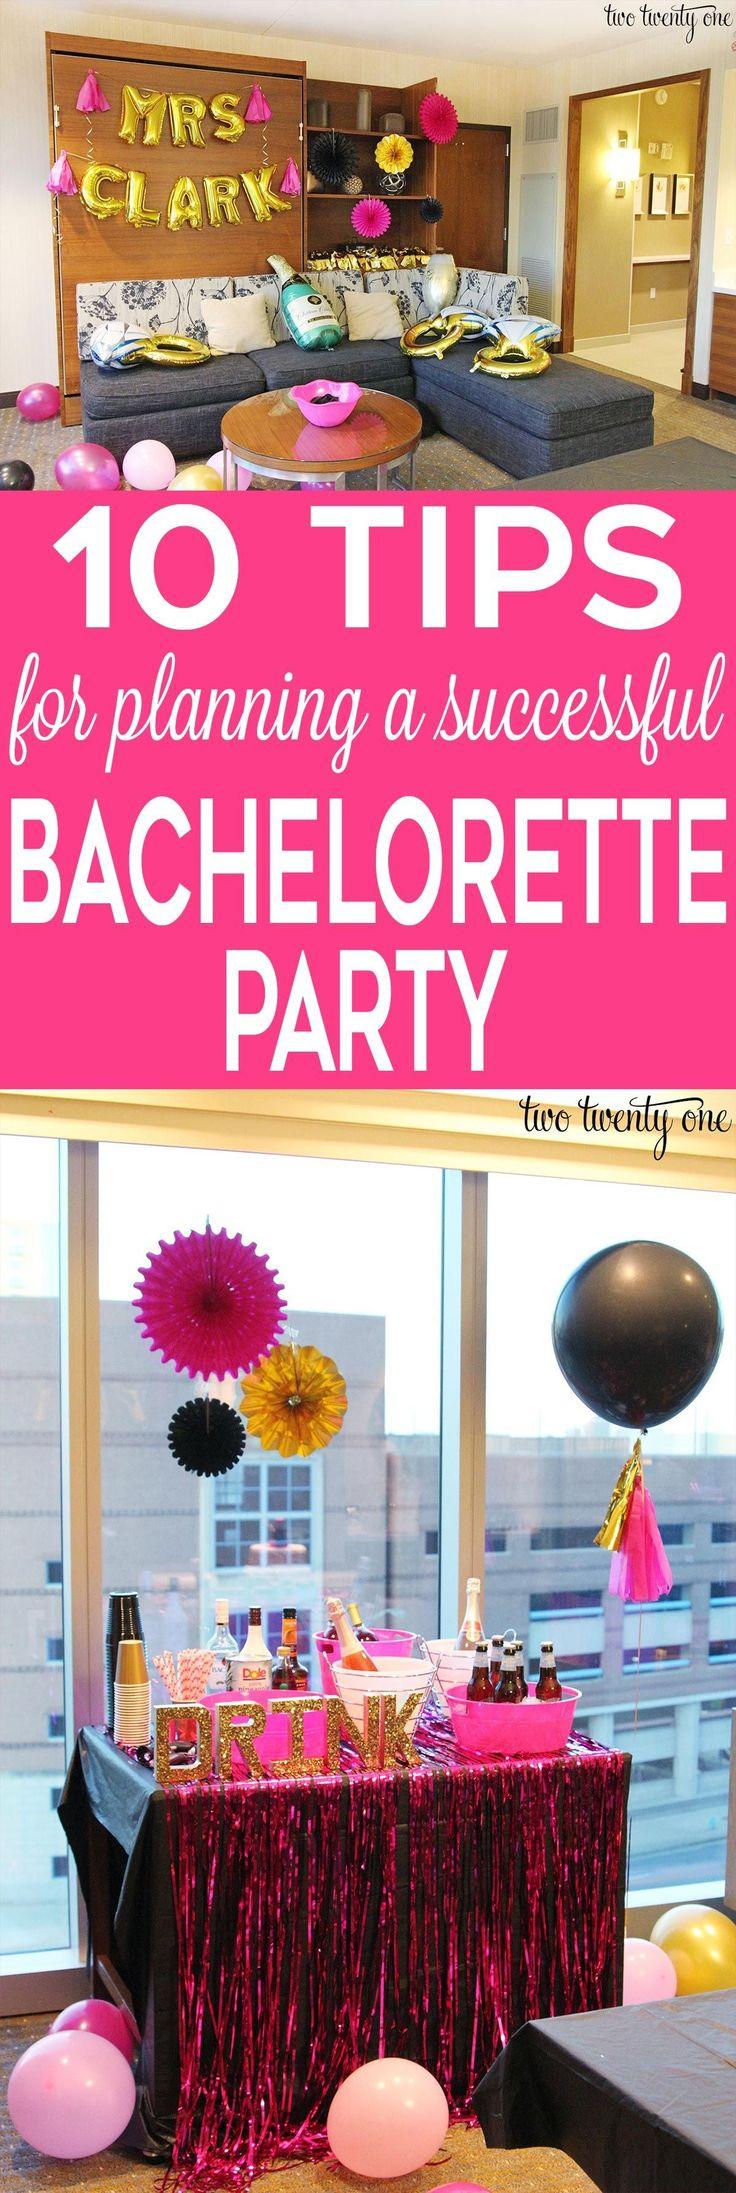 Mejores 4369 imágenes de Affordable Wedding Ideas en Pinterest ...